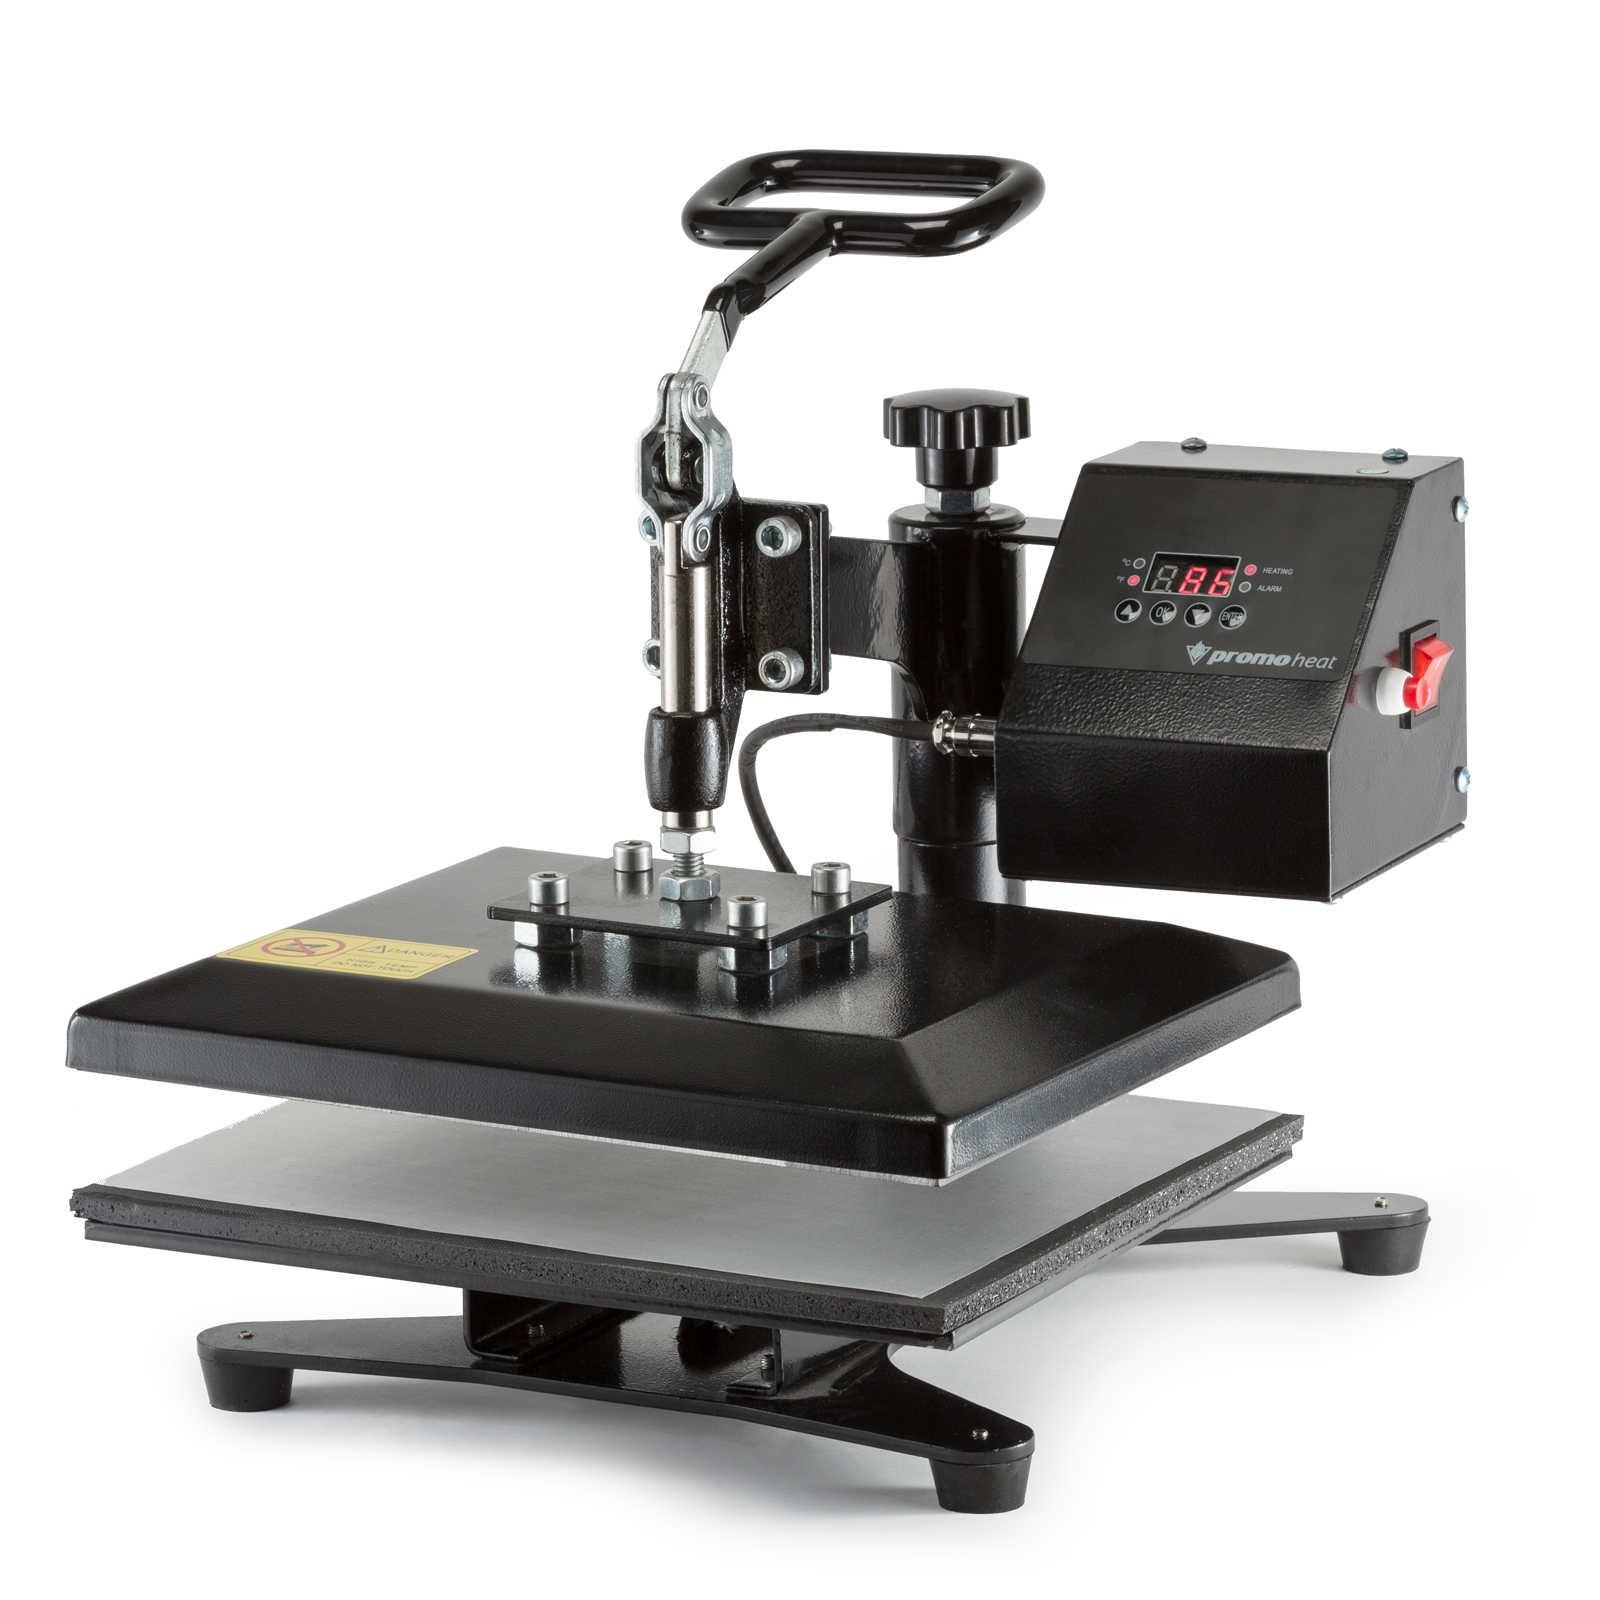 Promo Heat Swing-away Sublimation Heat Transfer Press Machine by Promo Heat